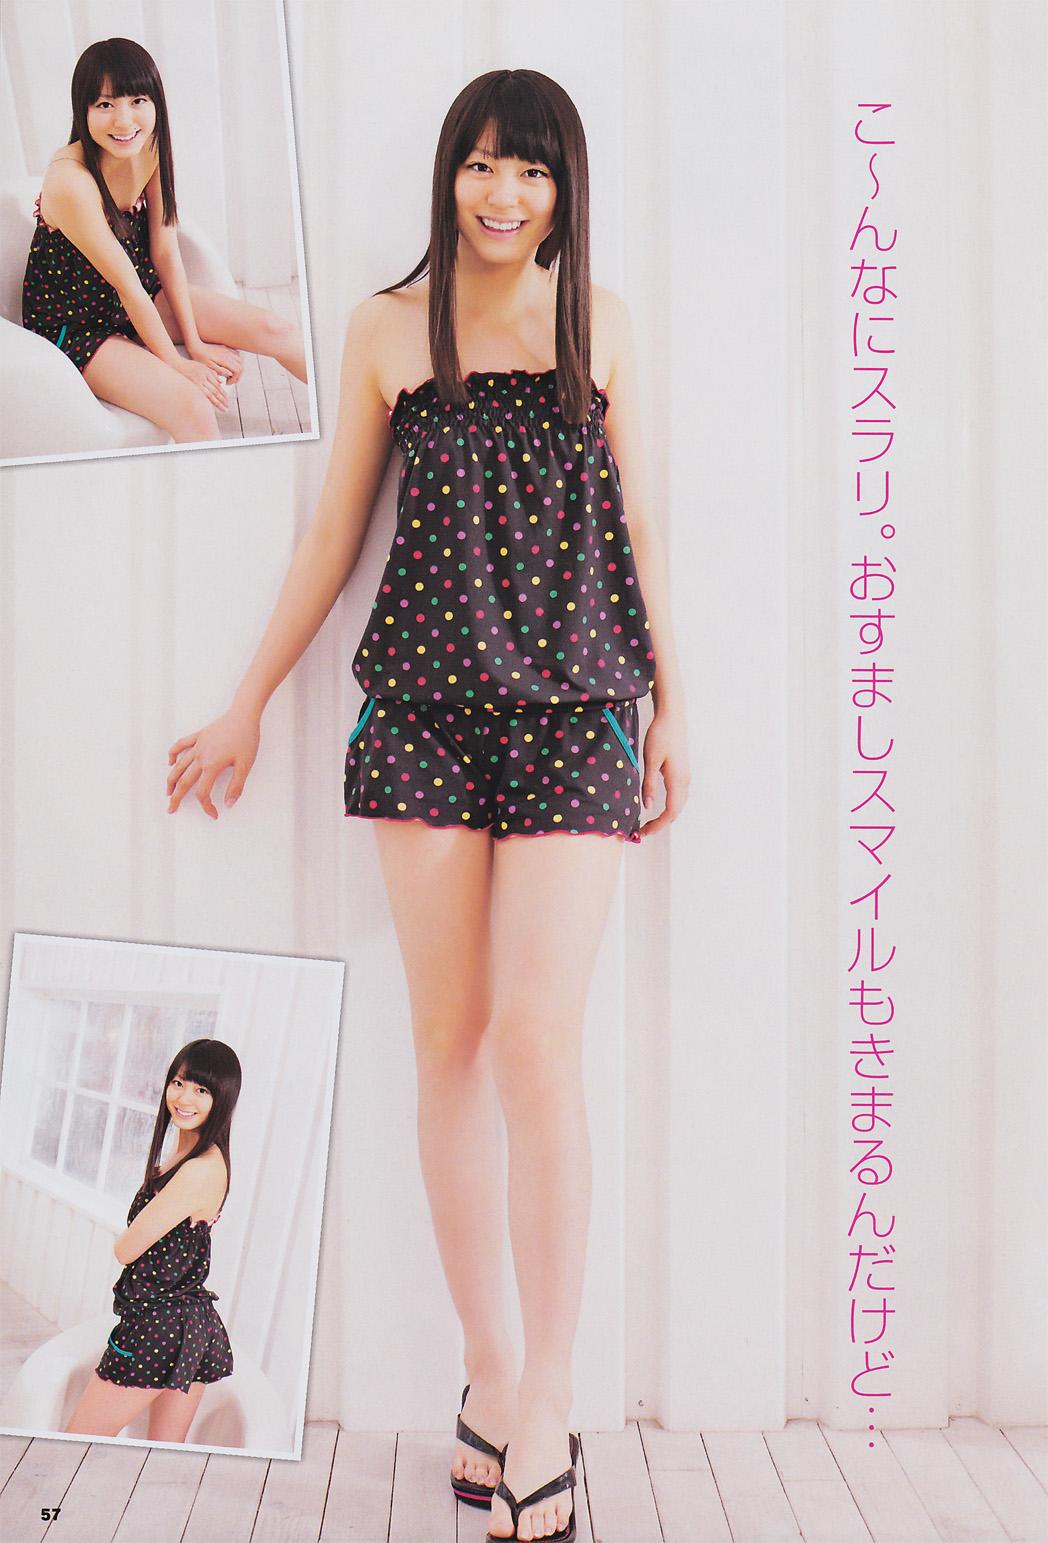 大川藍の画像 p1_9